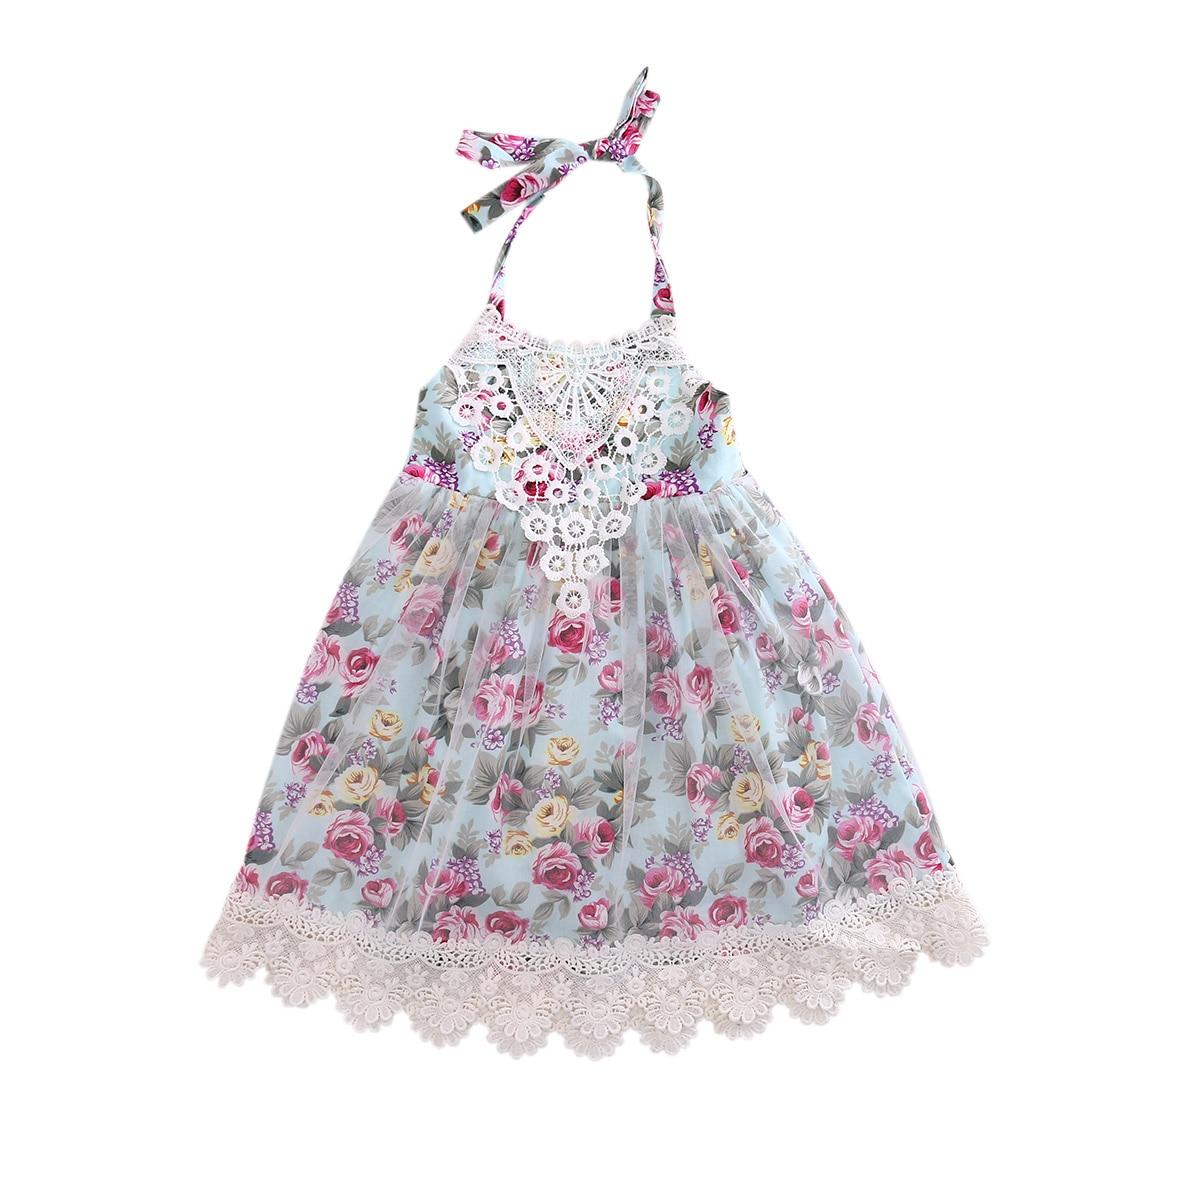 Toddler Kids Baby Girls Lace Floral Dress 2017 Summer Tulle Party Dresses Summer Sundress Children Clothes toddler kids baby girls clothes lace top dress crop tee dresses party sundress